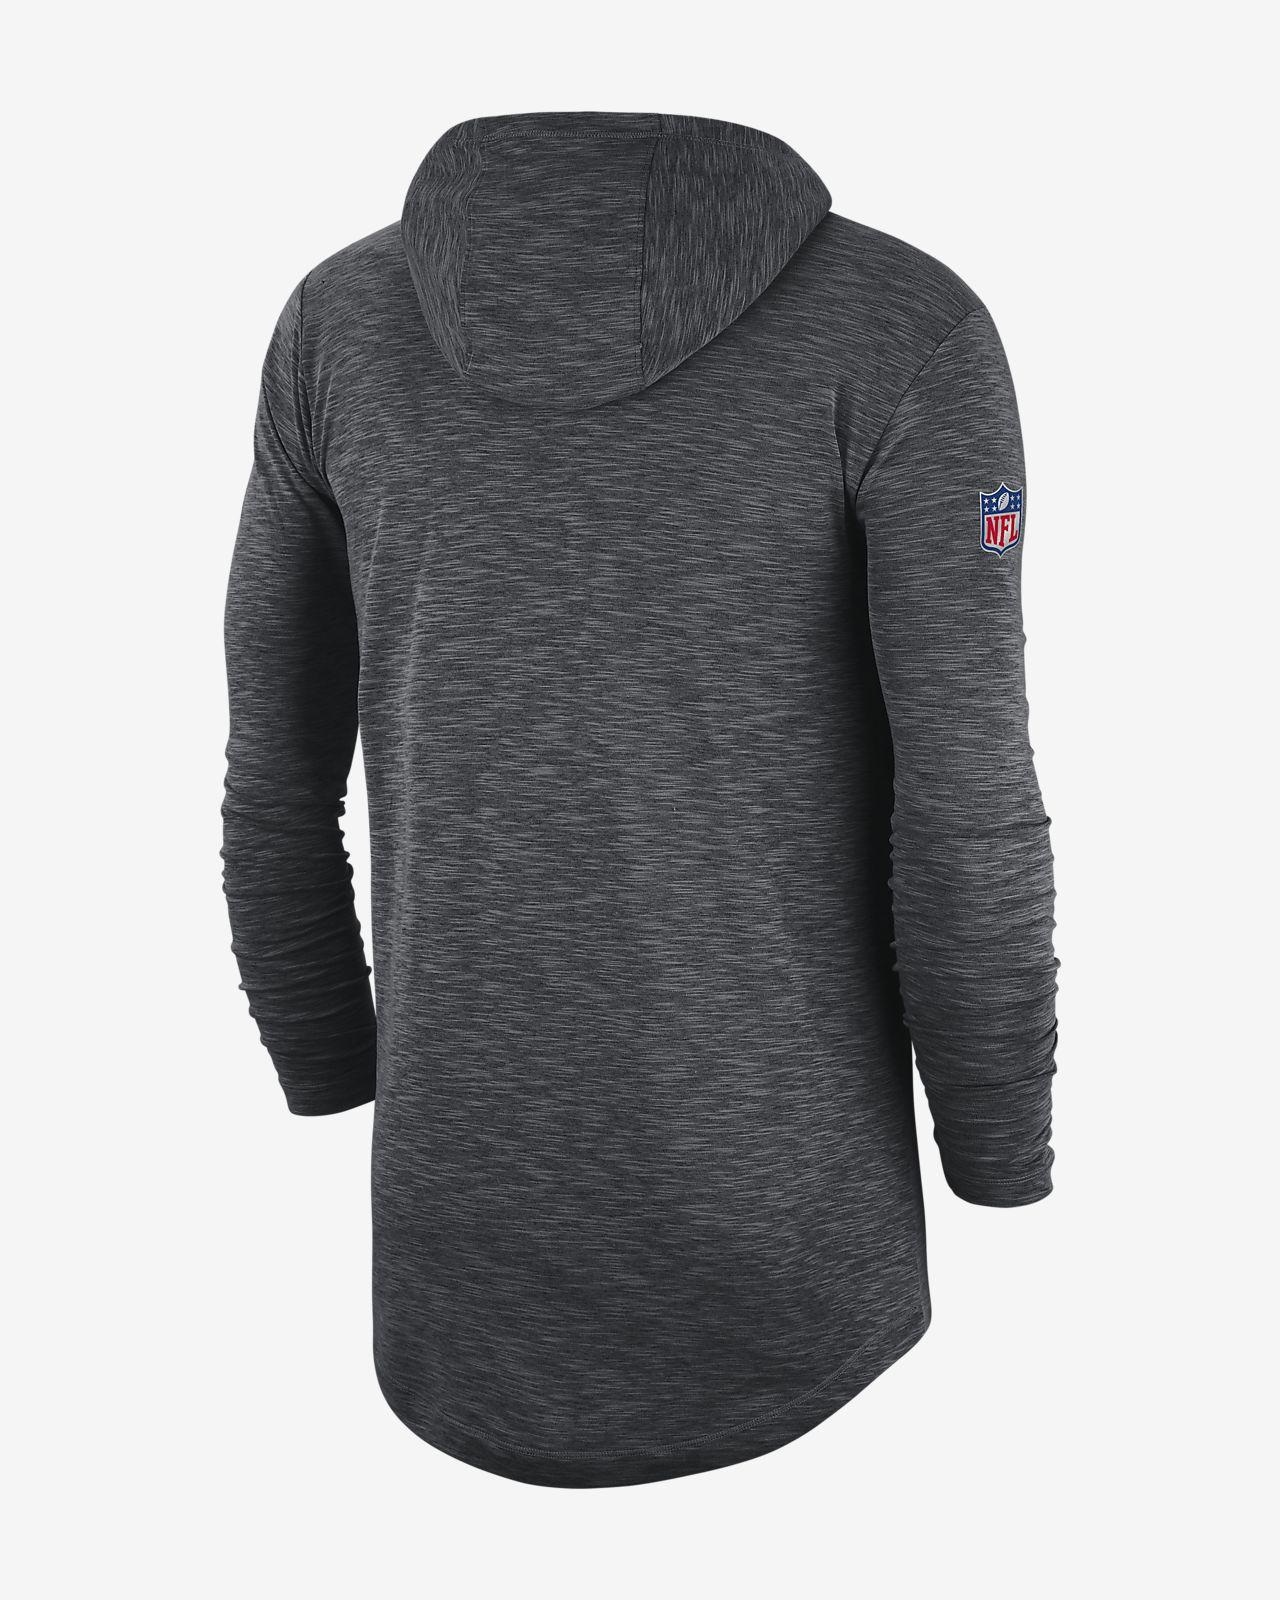 huge discount c8392 c56cc Nike Dri-FIT (NFL Colts) Men's Hoodie